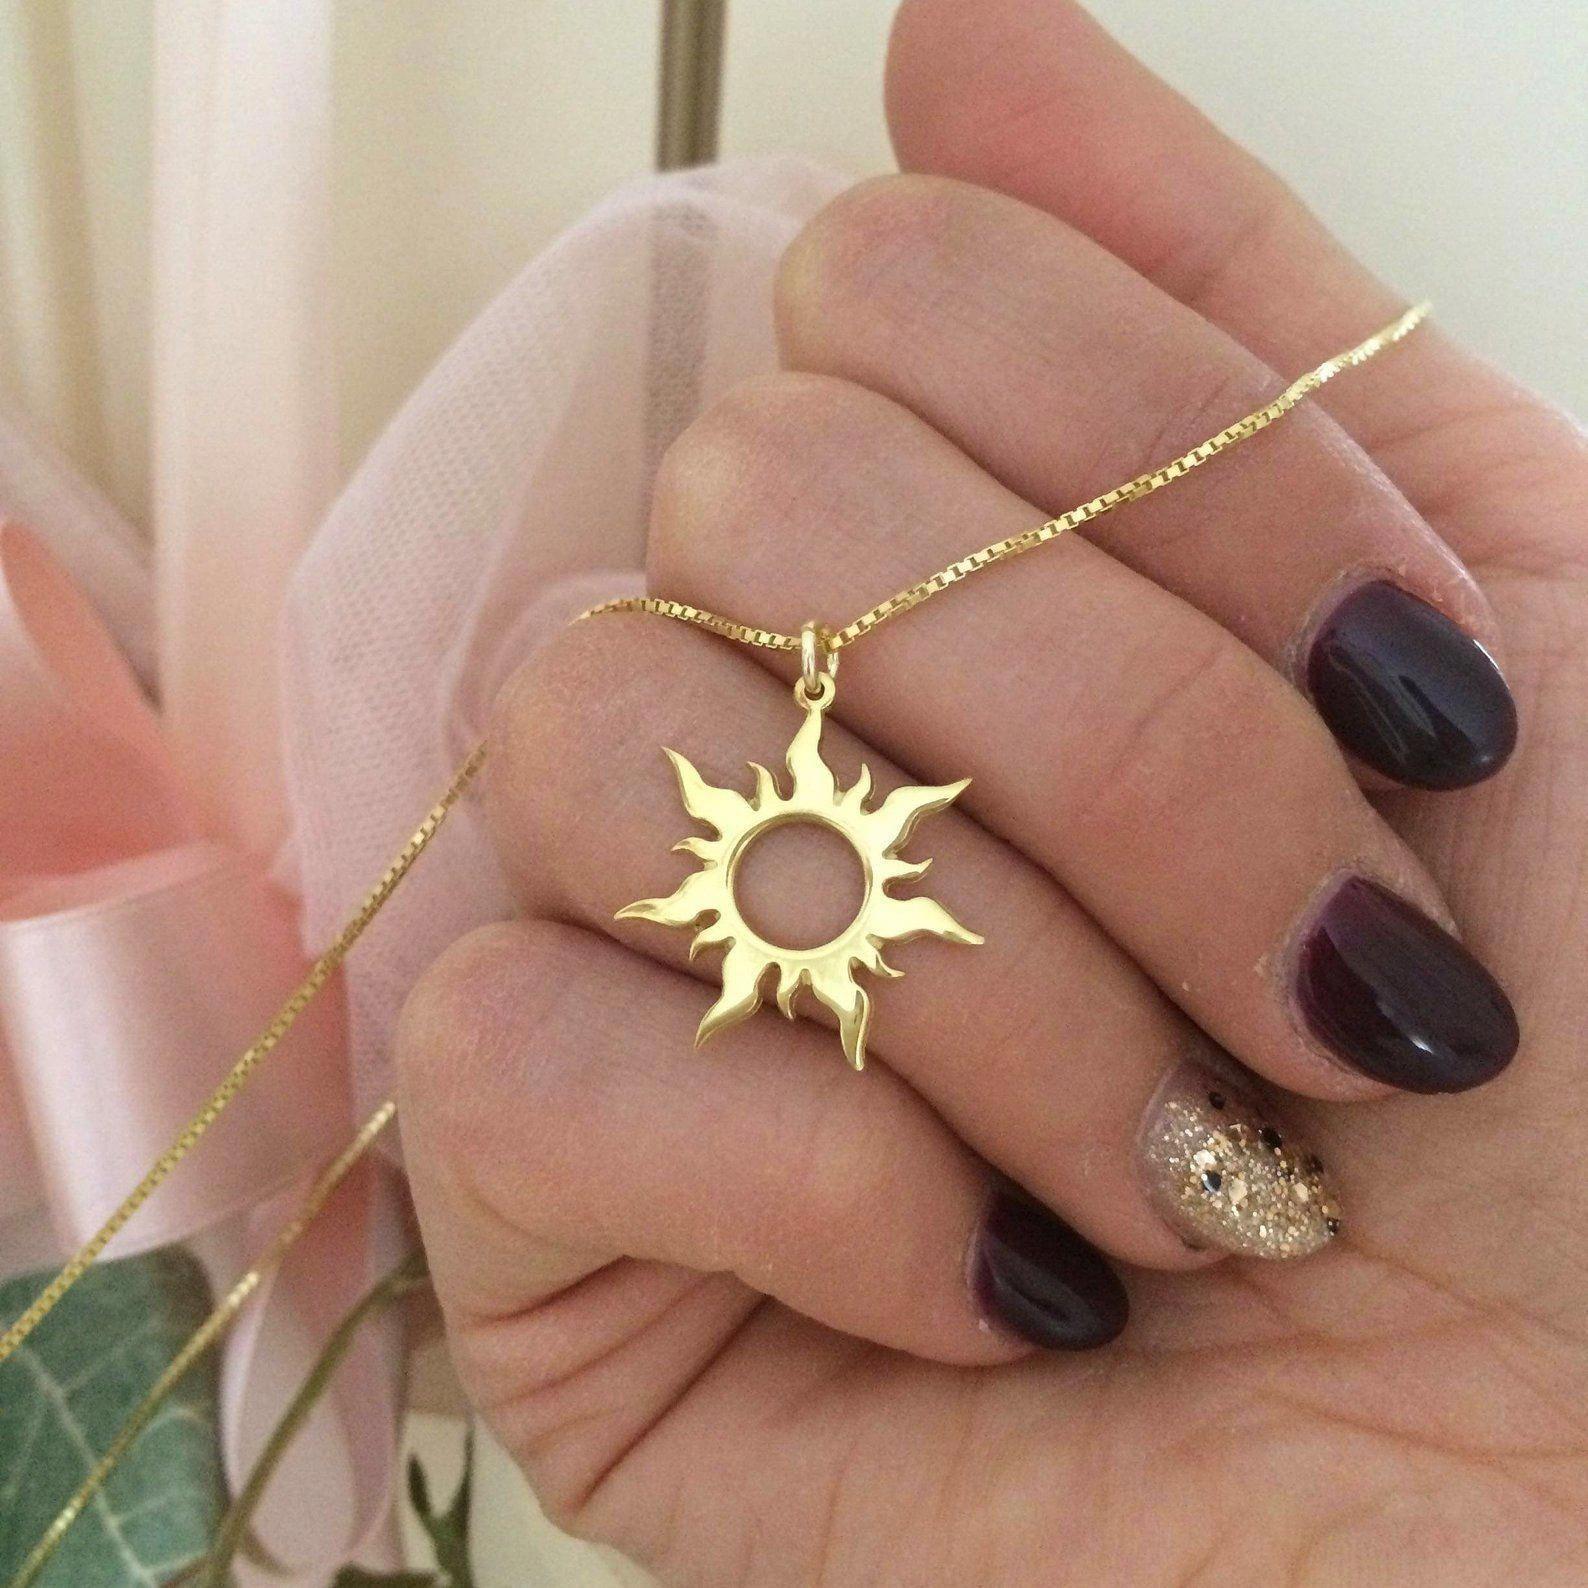 14k Solid Gold Sun Necklace Rapunzel Sun Pendant Etsy Goldnamenecklace Eleganteveningdresses Diamond Necklace Designs Necklace Designs Cute Jewelry